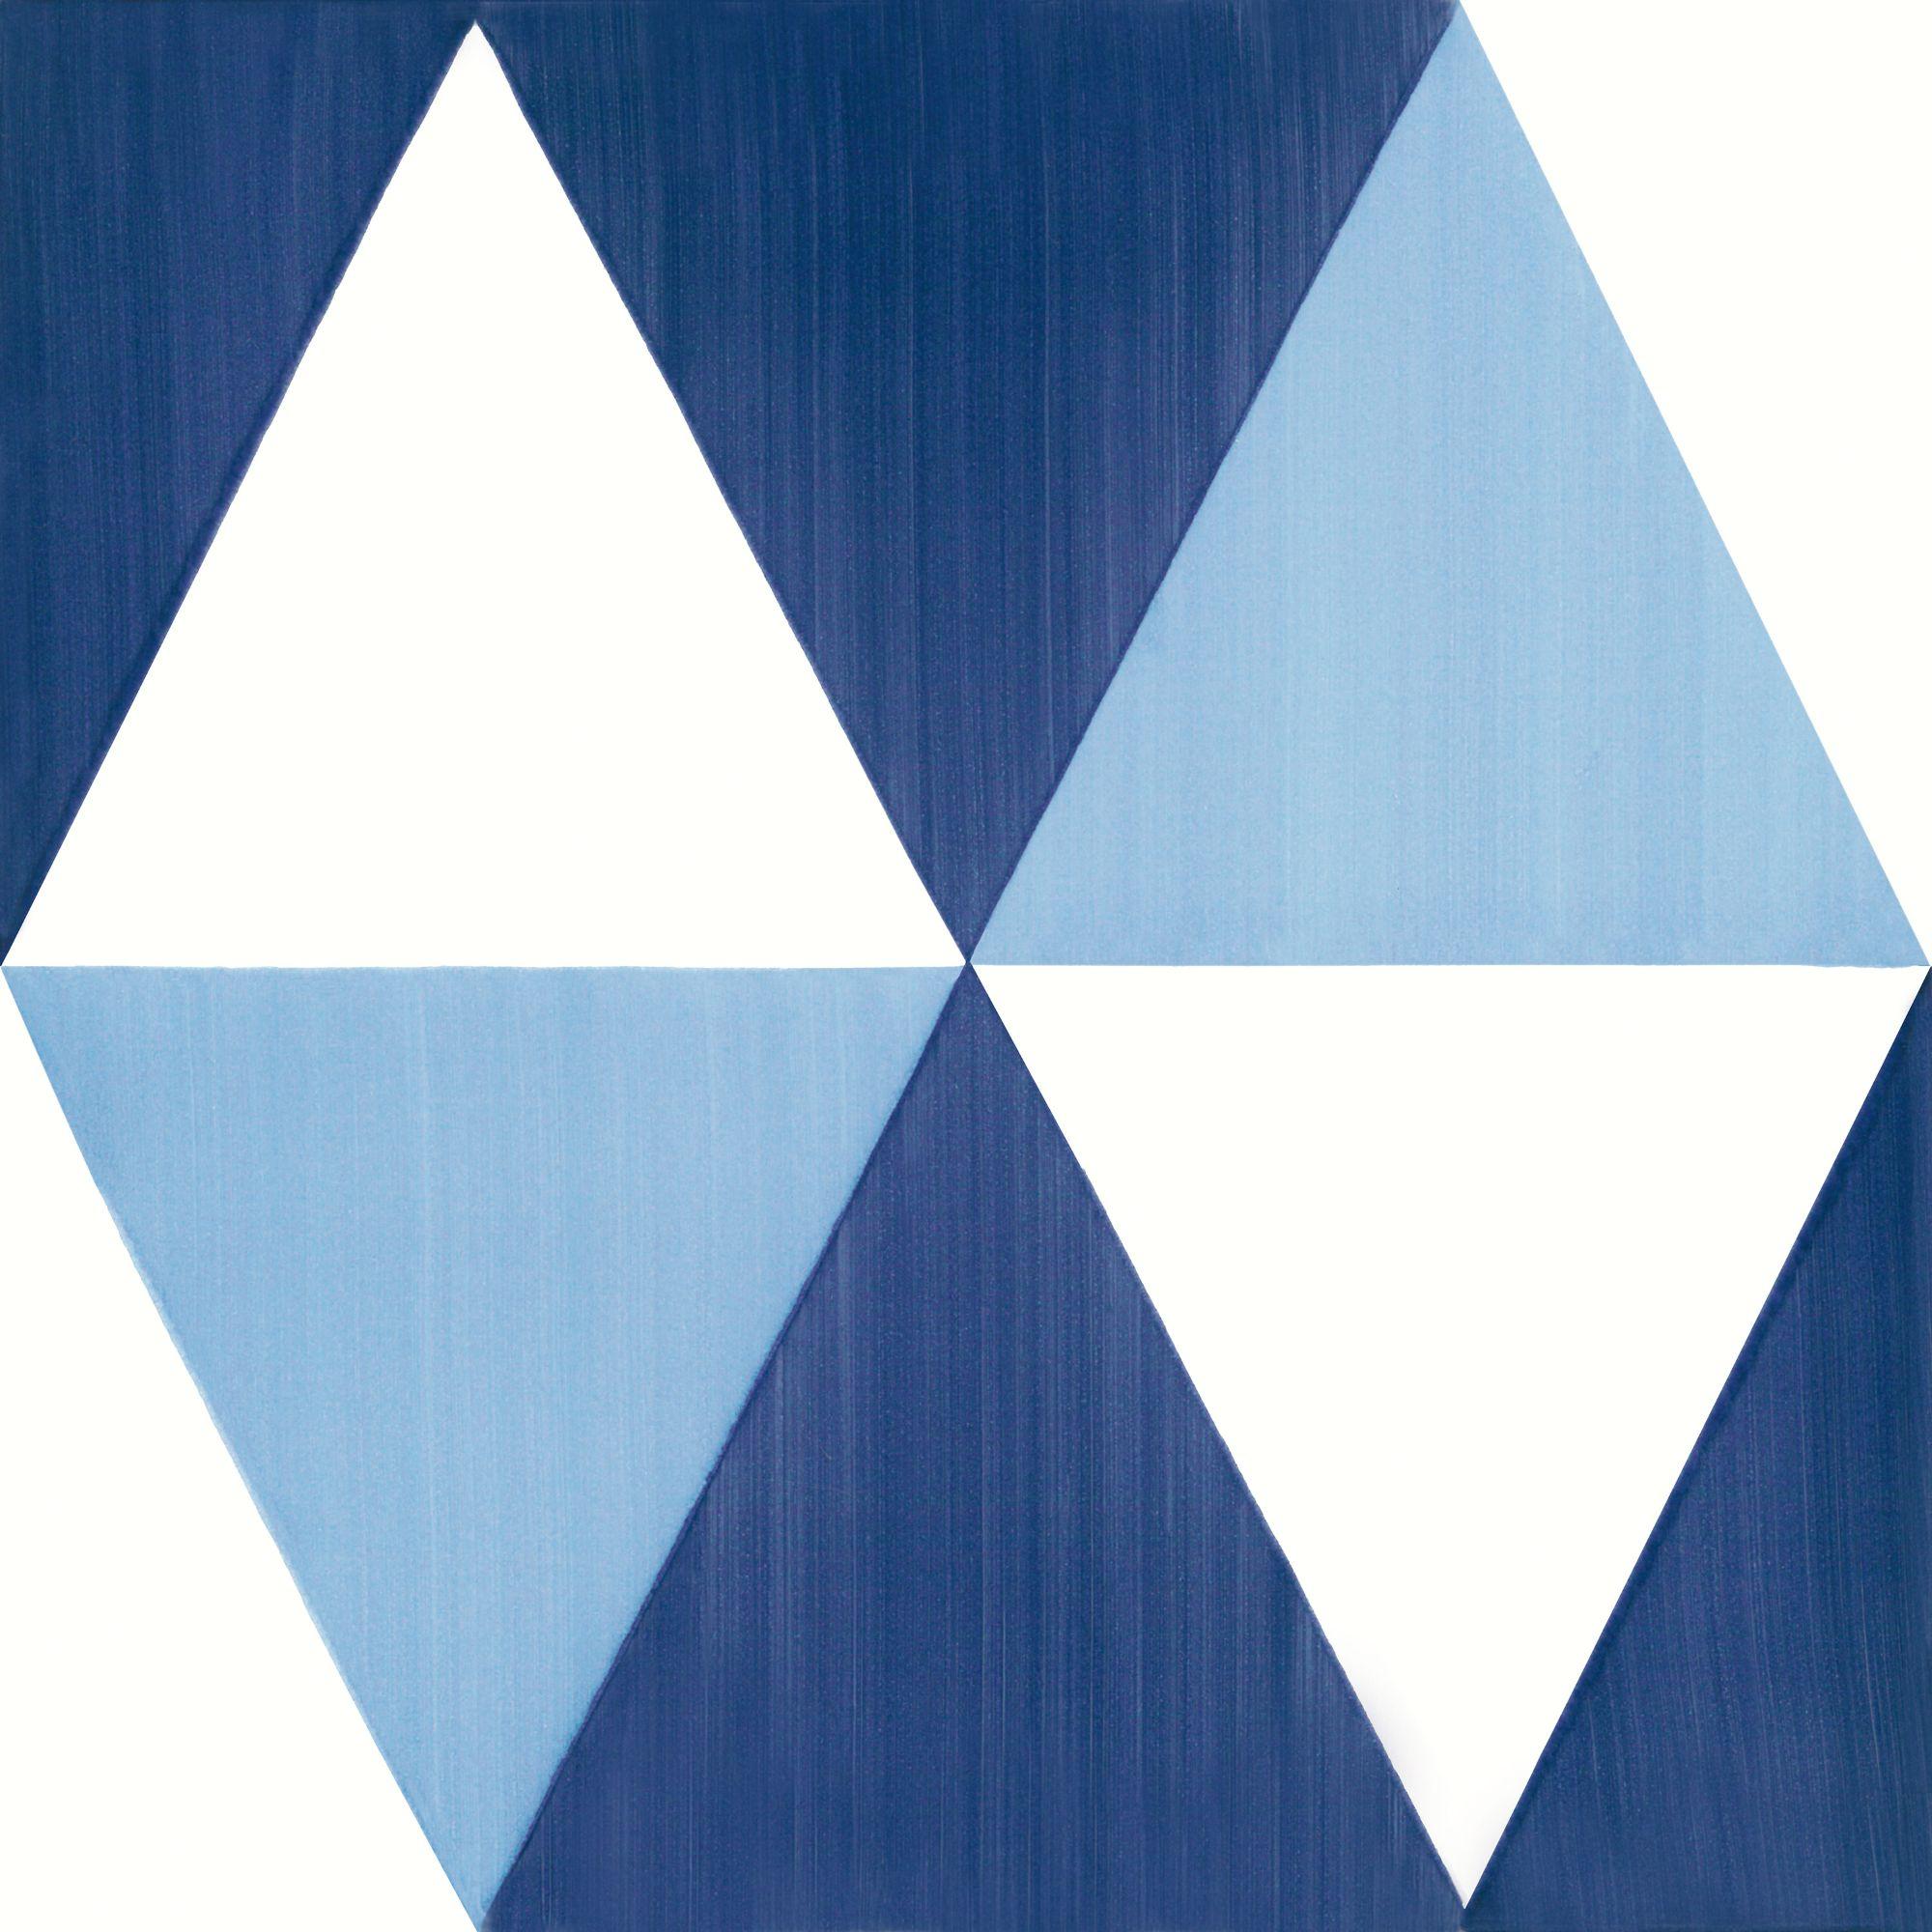 blu-ponti-decoro-tipo-7